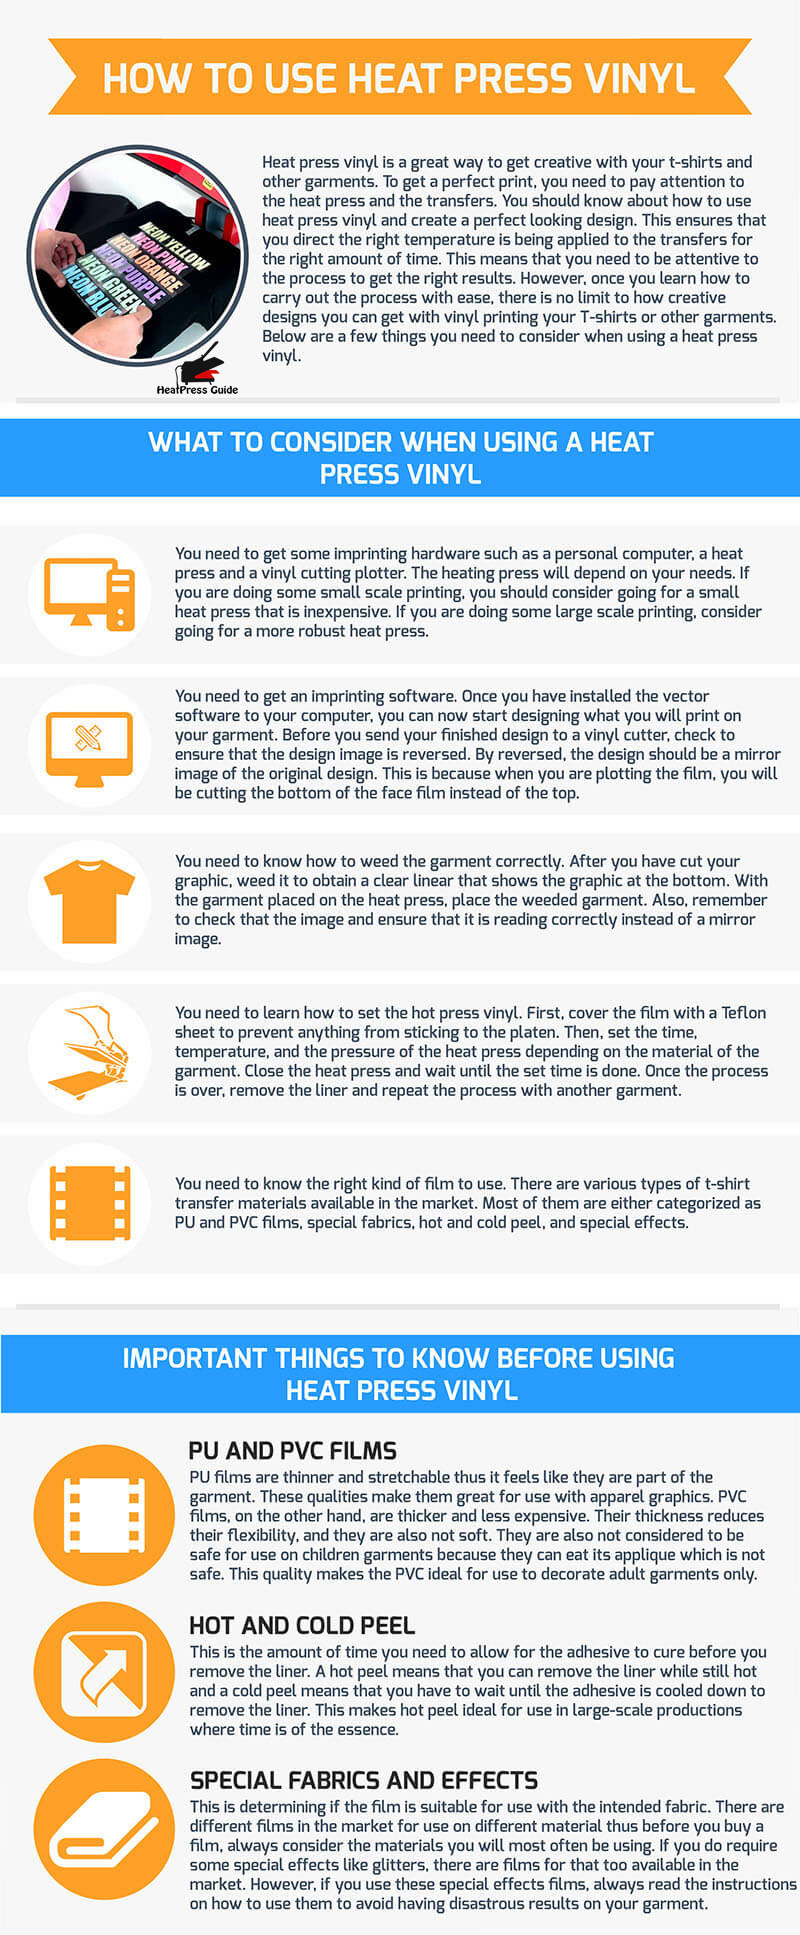 How to use heatpress vinyl